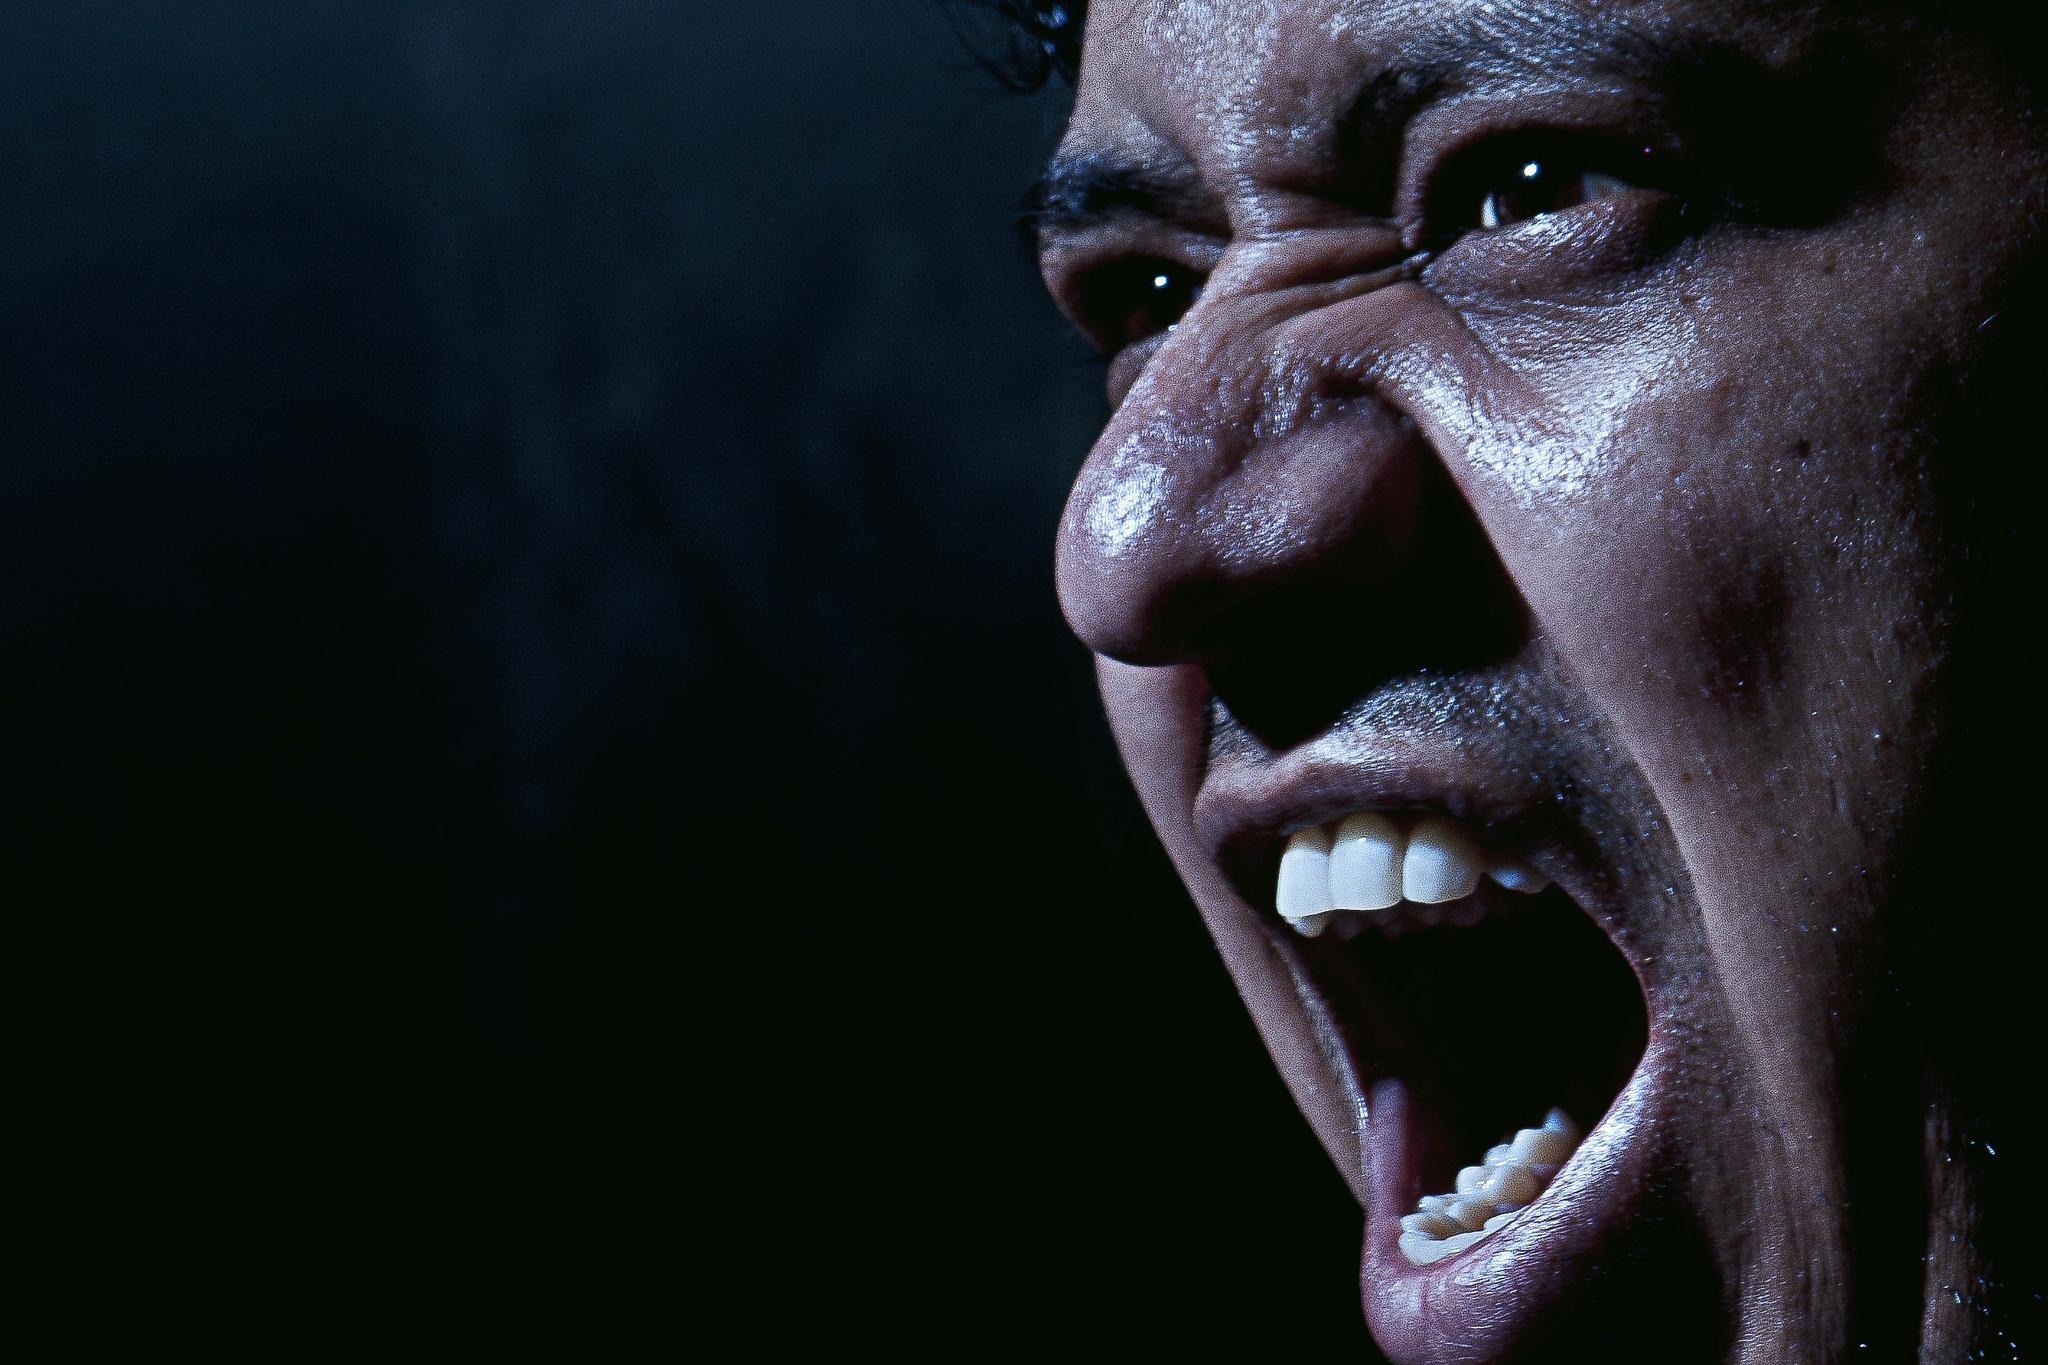 Anger  bySaurabh Vyas